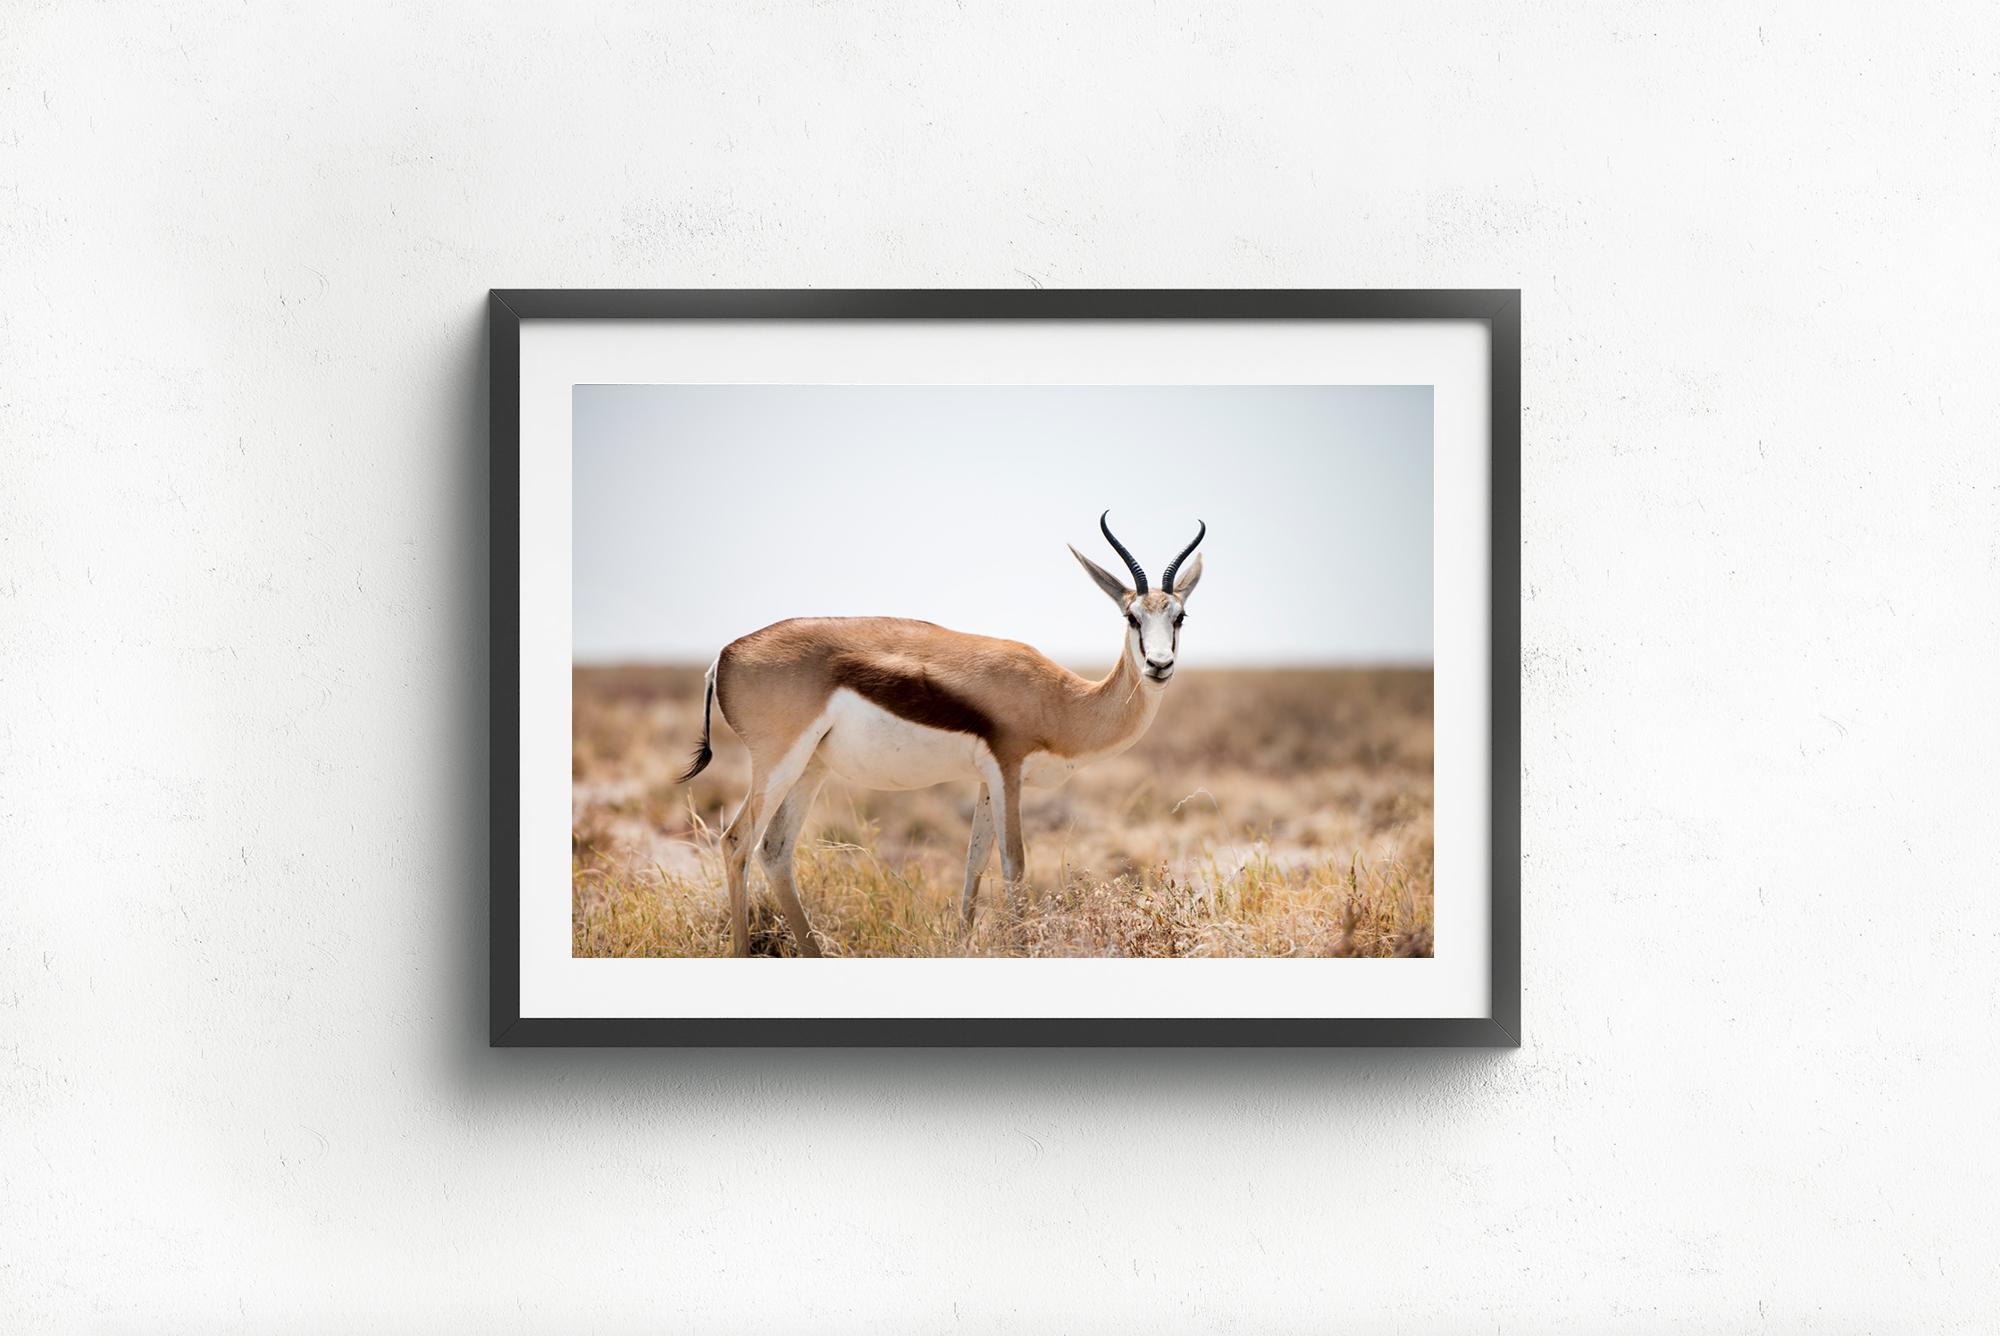 Antilop.jpg